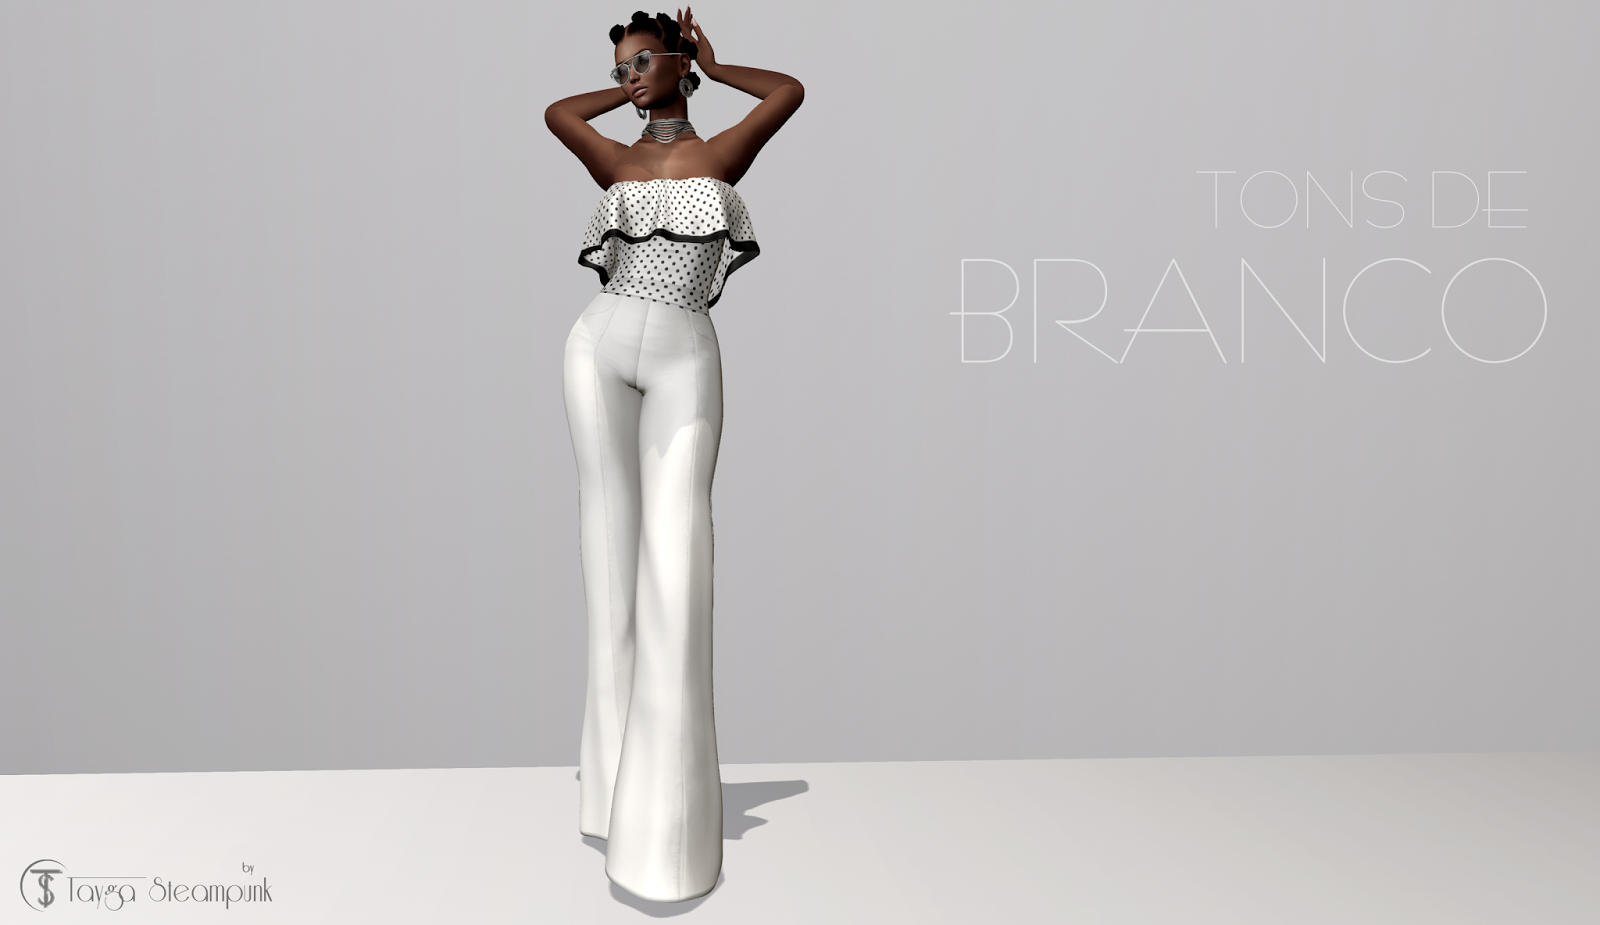 TS# 264 Tons de Branco